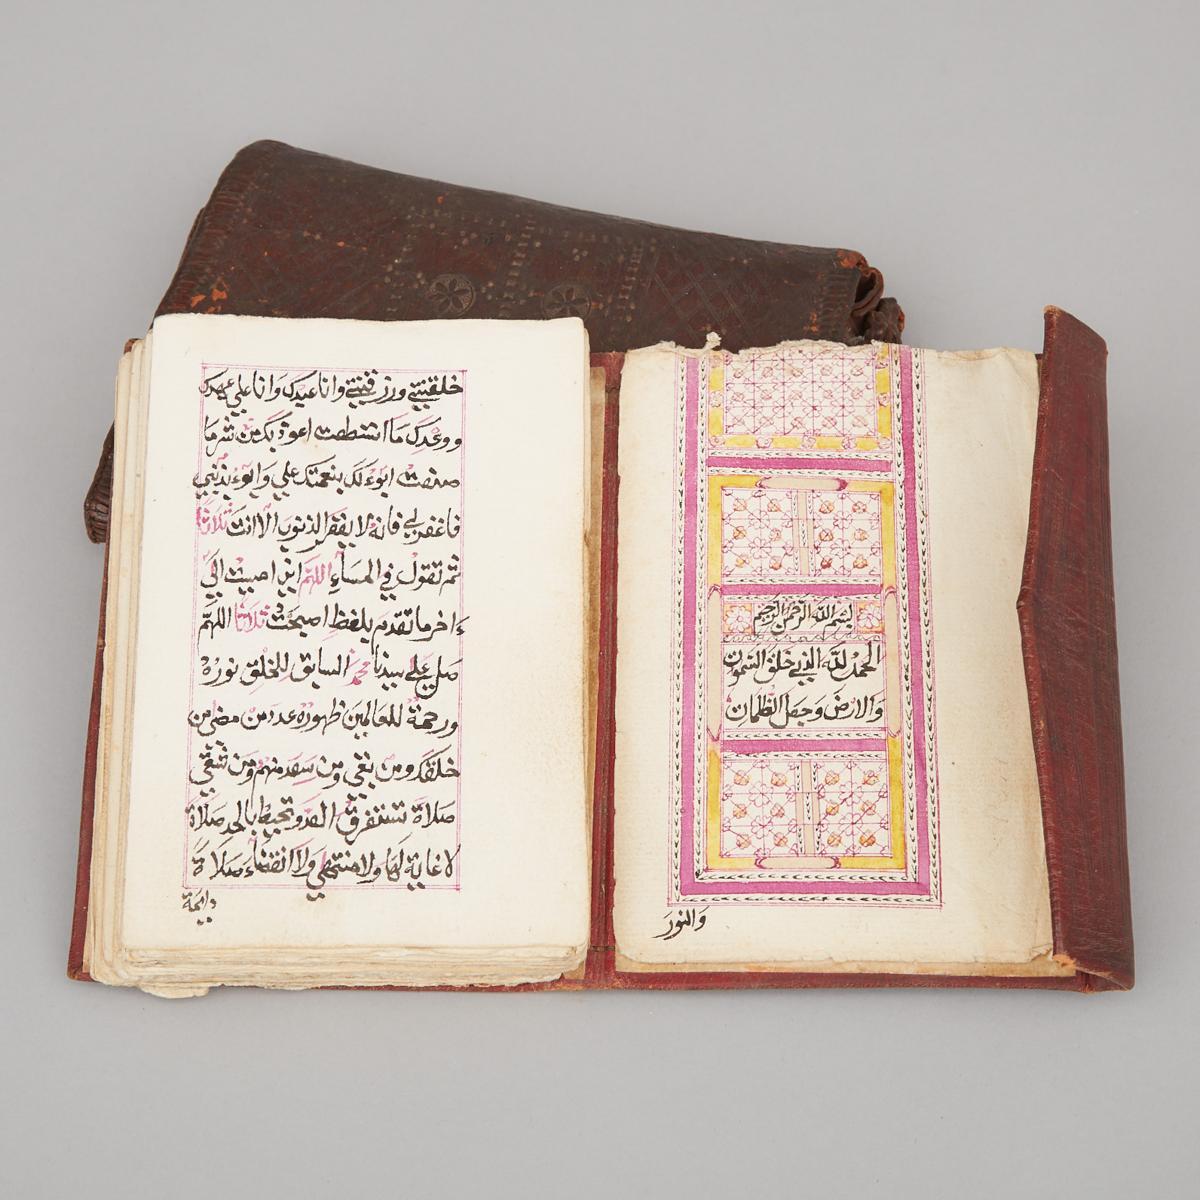 Islamic Prayer Manuscript, 19th century, 7 x 5.5 in — 17.8 x 14 cm